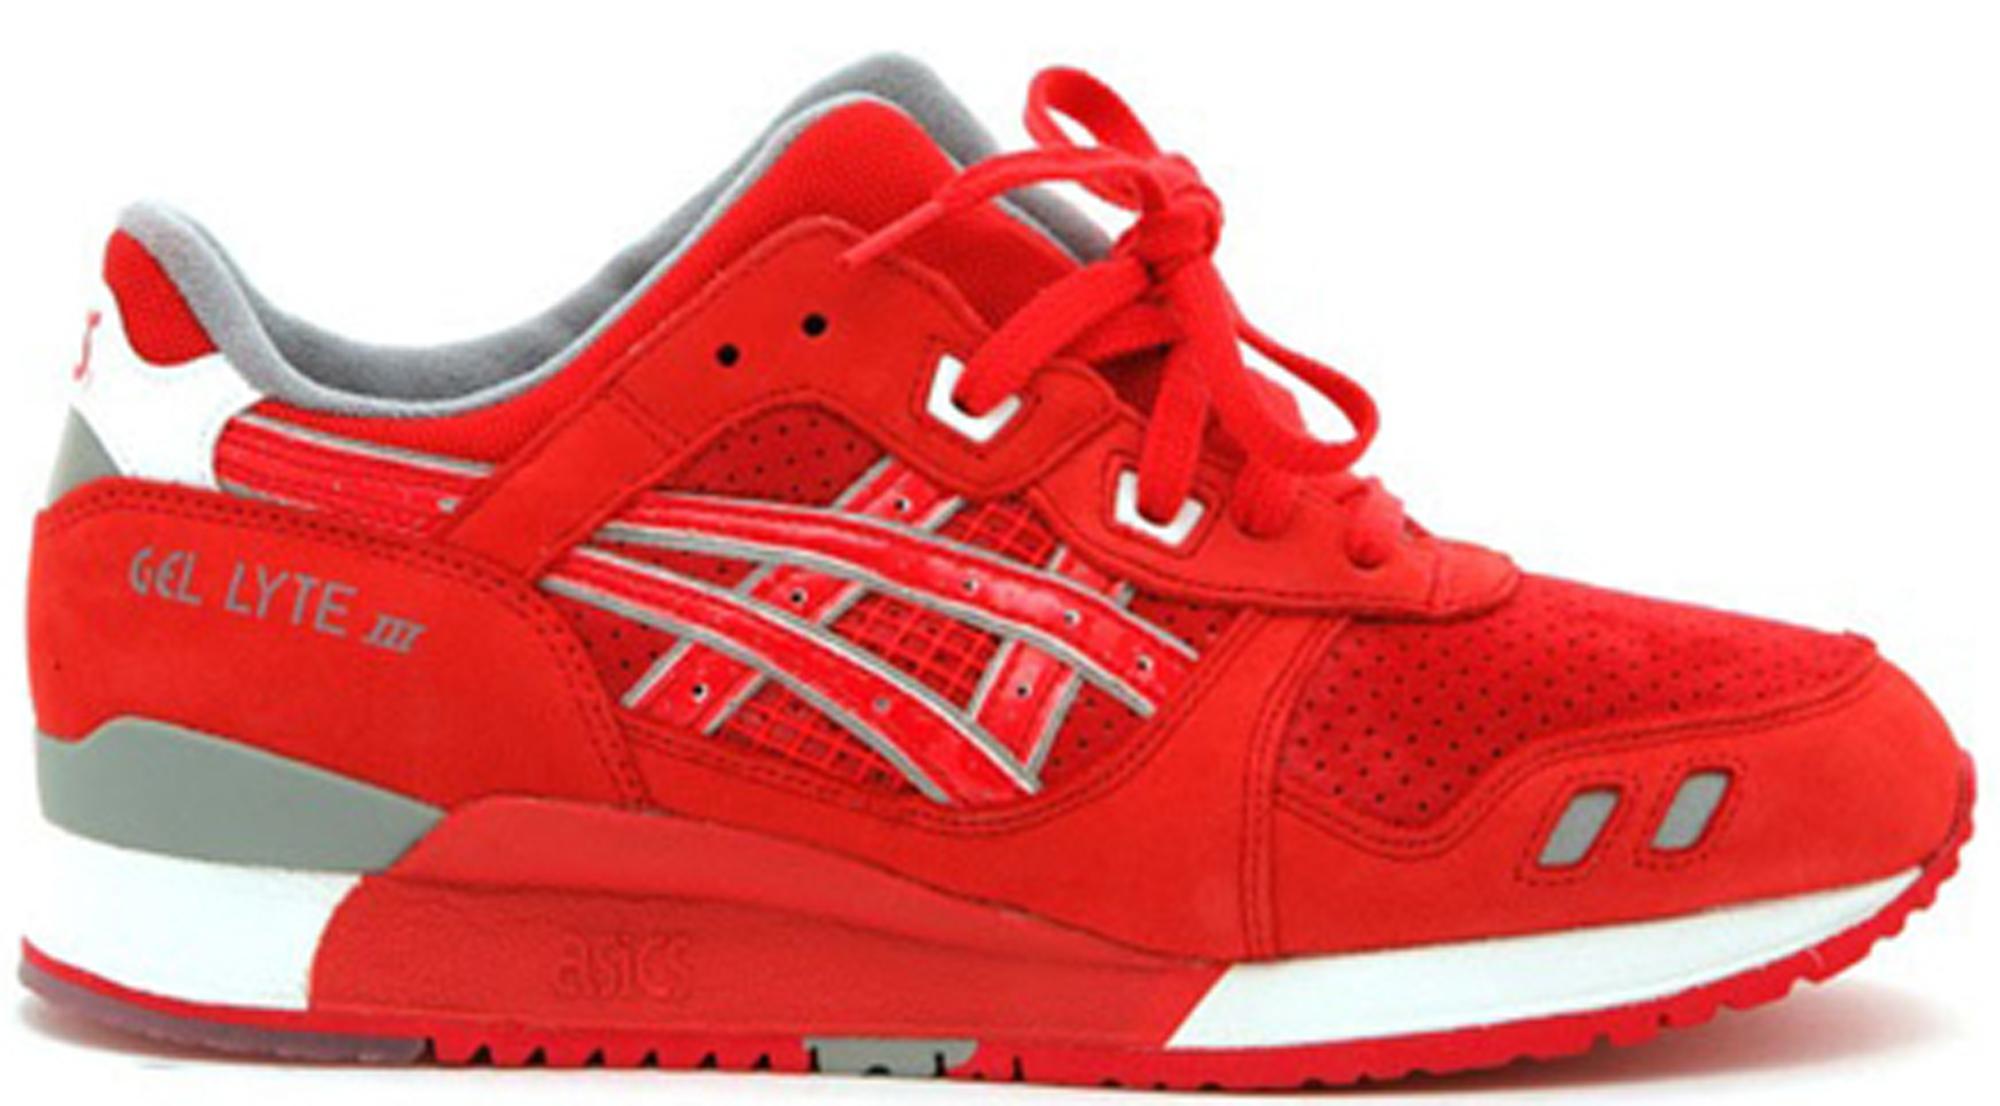 176bf597b03164 Lyst - Asics Gel-lyte Iii Ronnie Fieg X Nice Kicks 1.0 in Red for Men